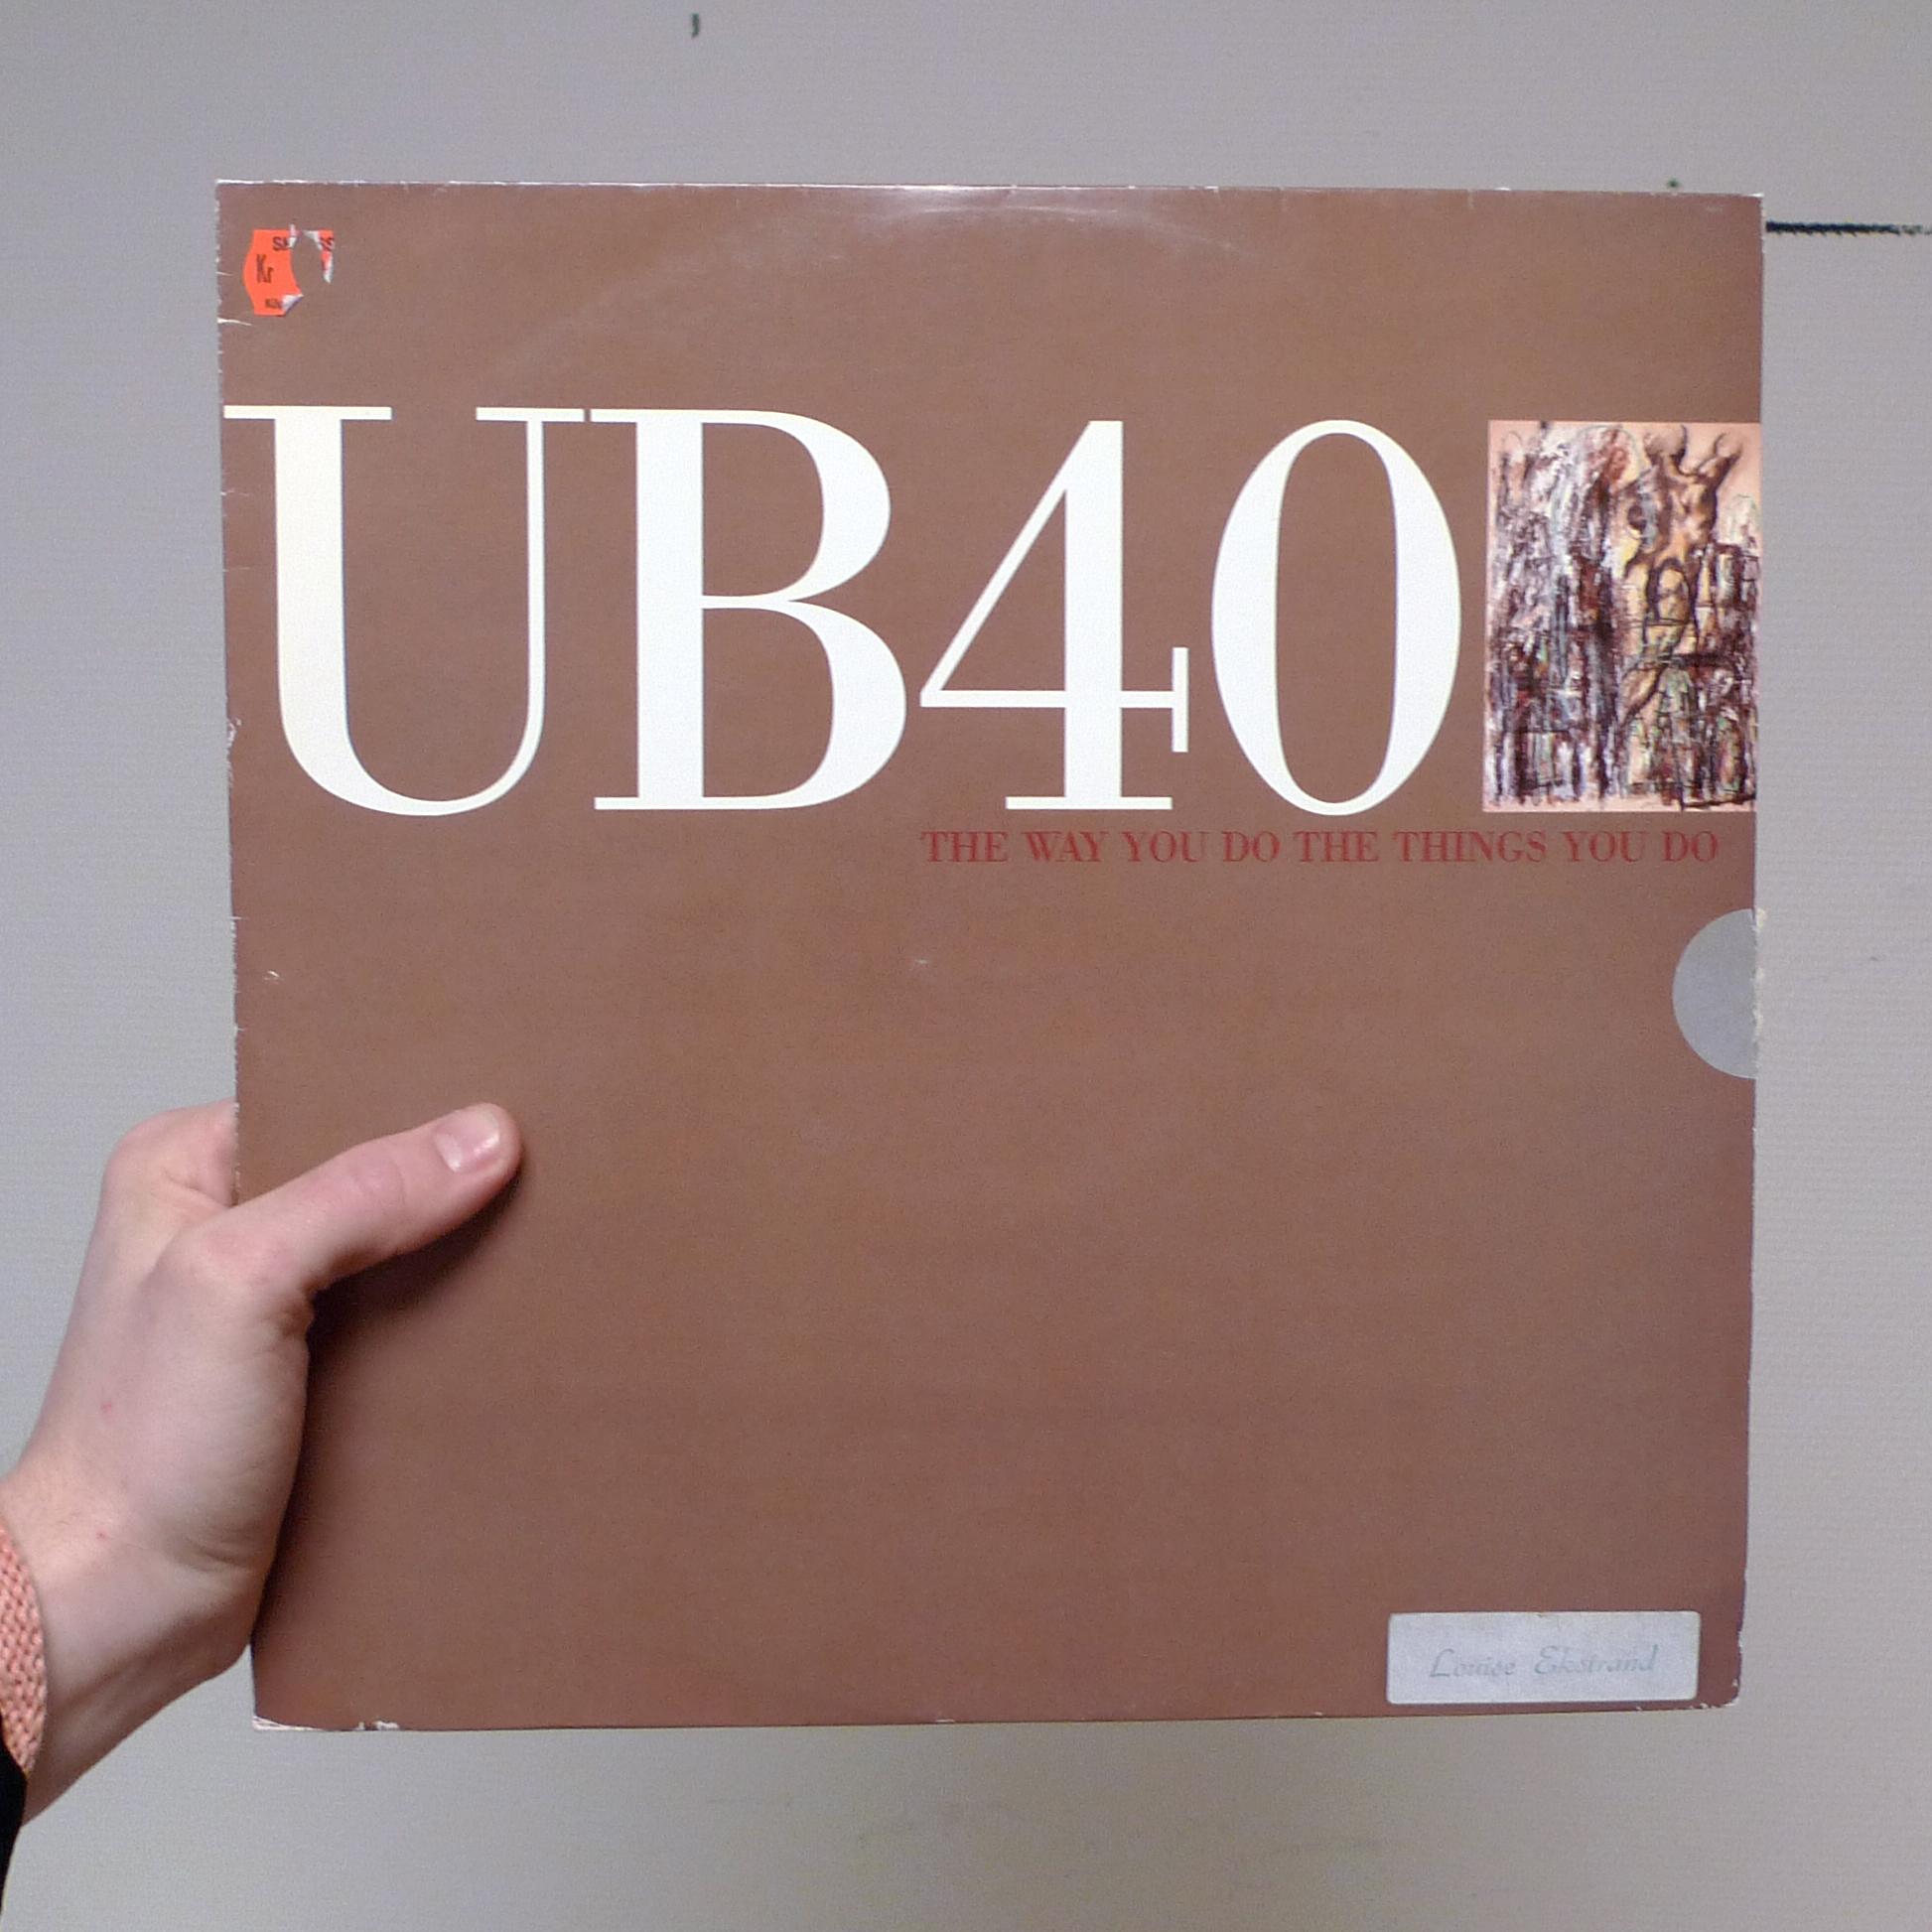 dj50 ep113 sleeve ub40